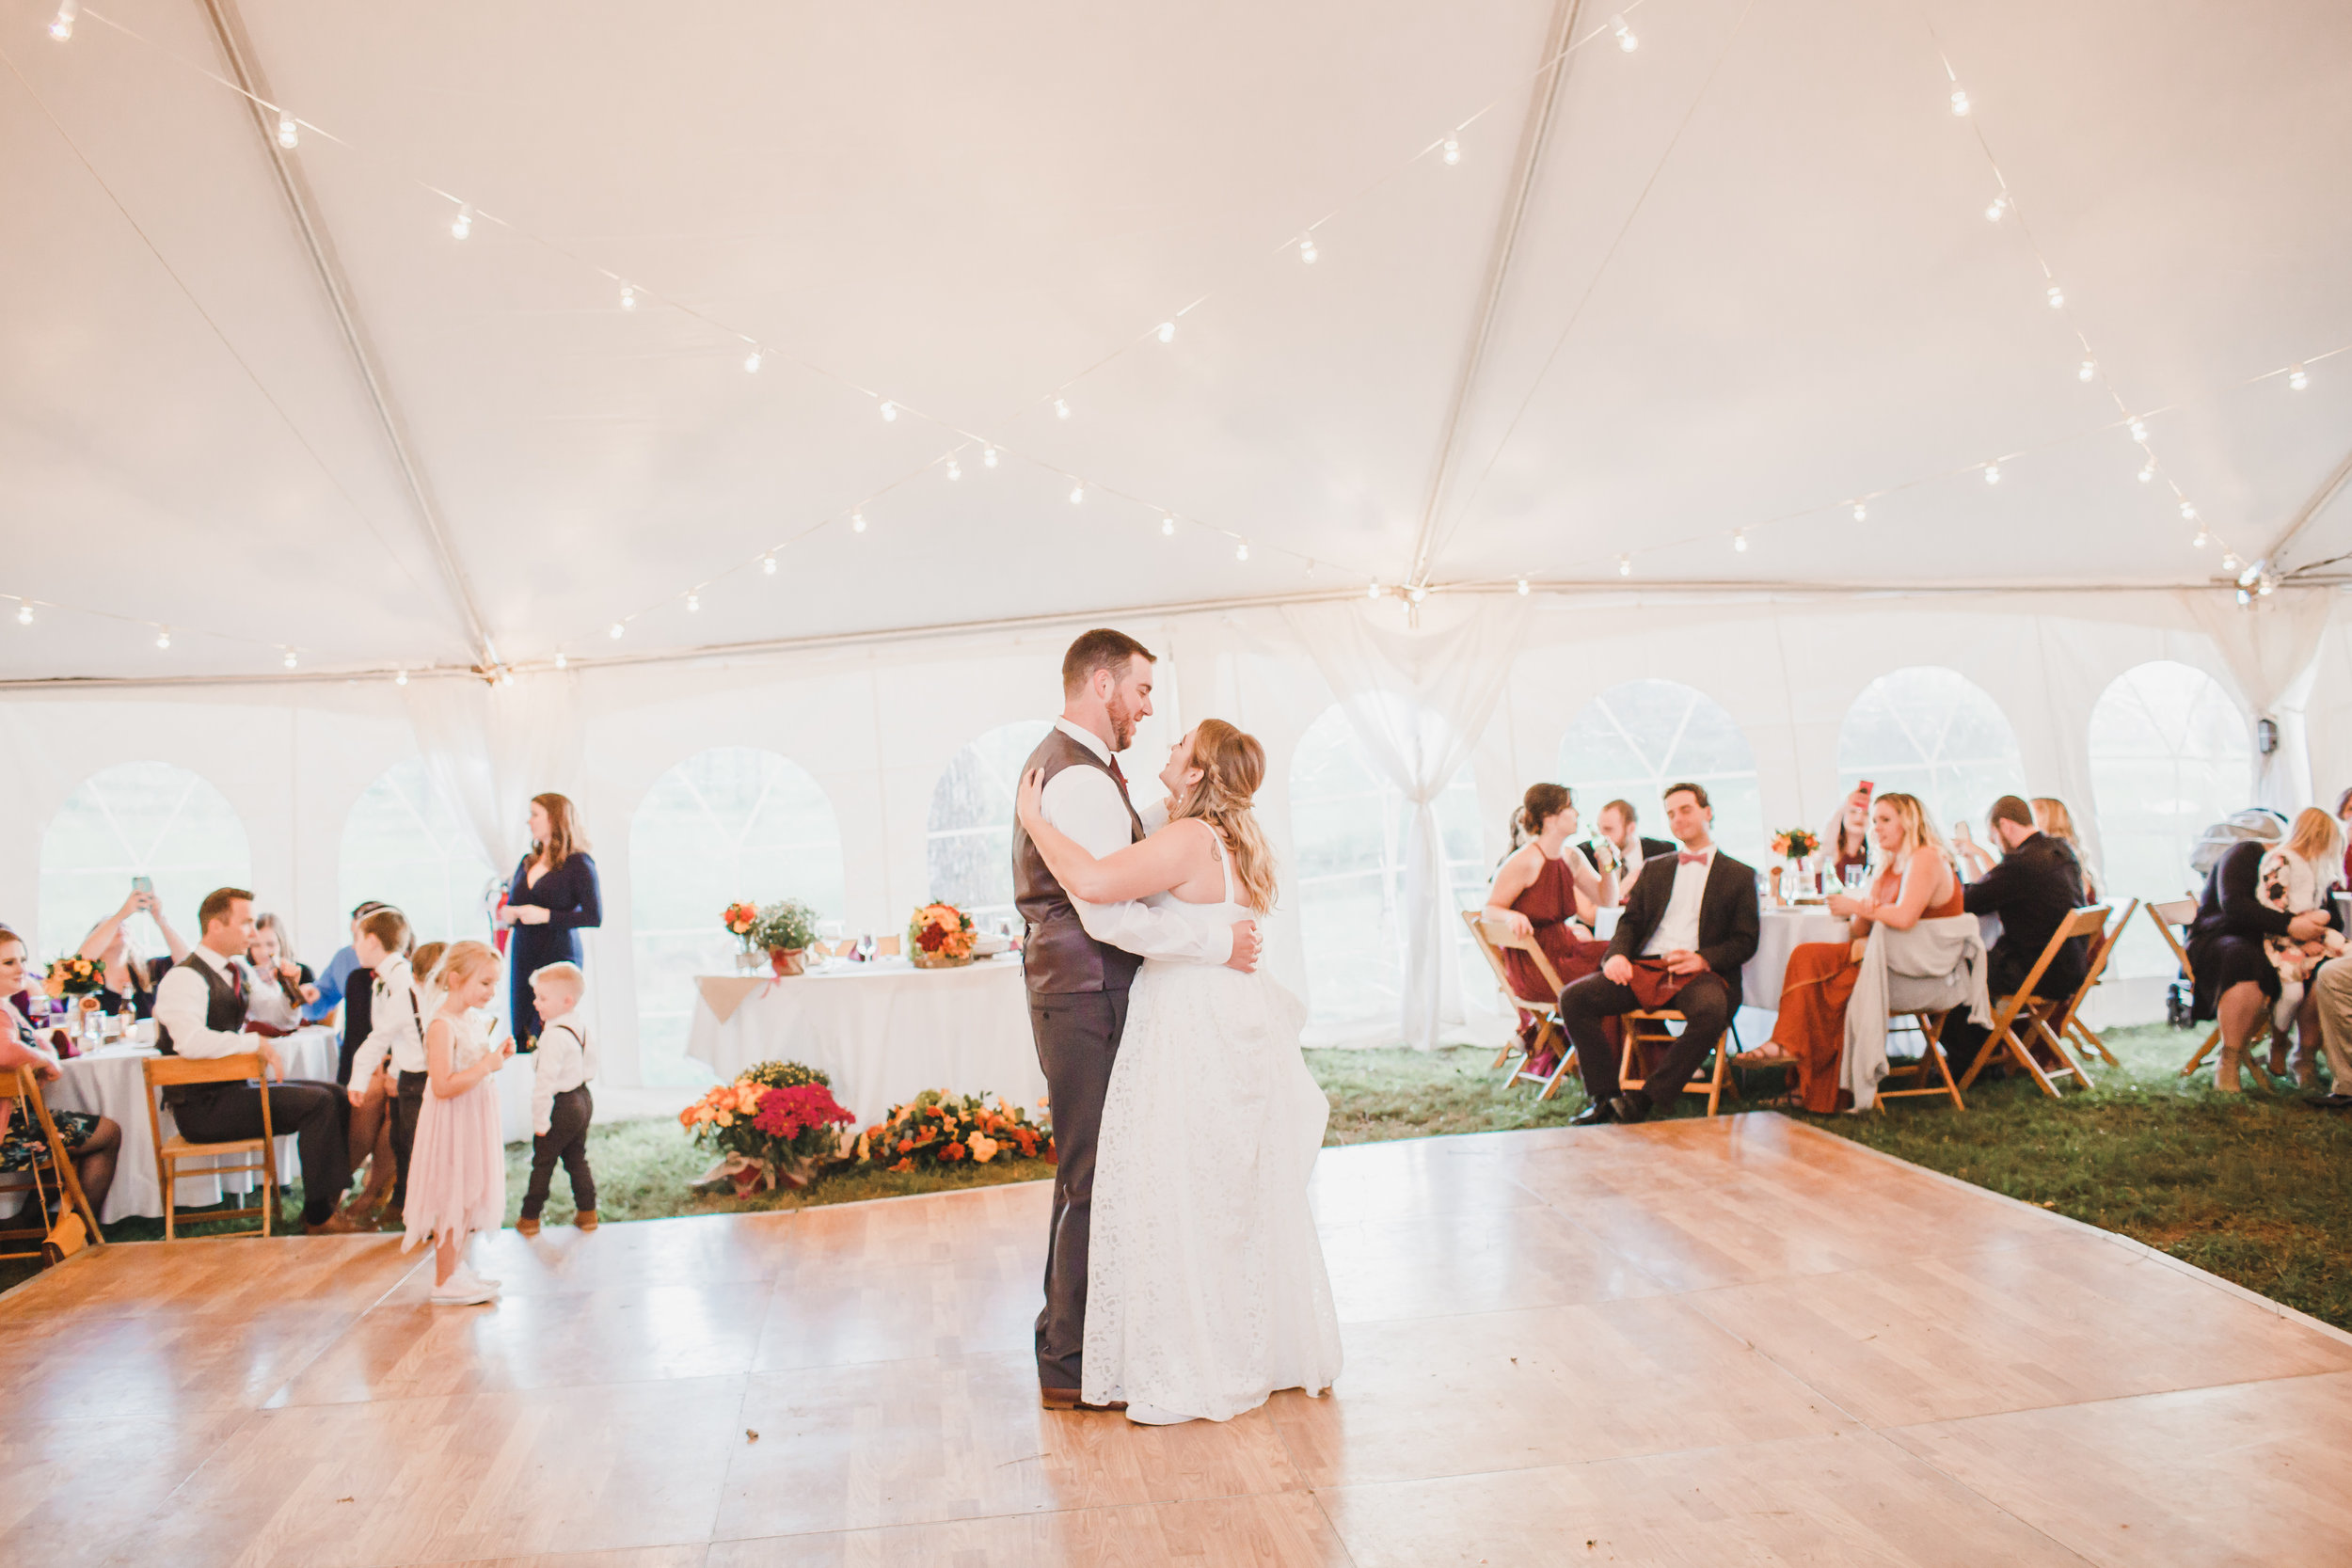 Fling - Virginia Wedding Photographer - Photography by Amy Nicole-4594-4.jpg